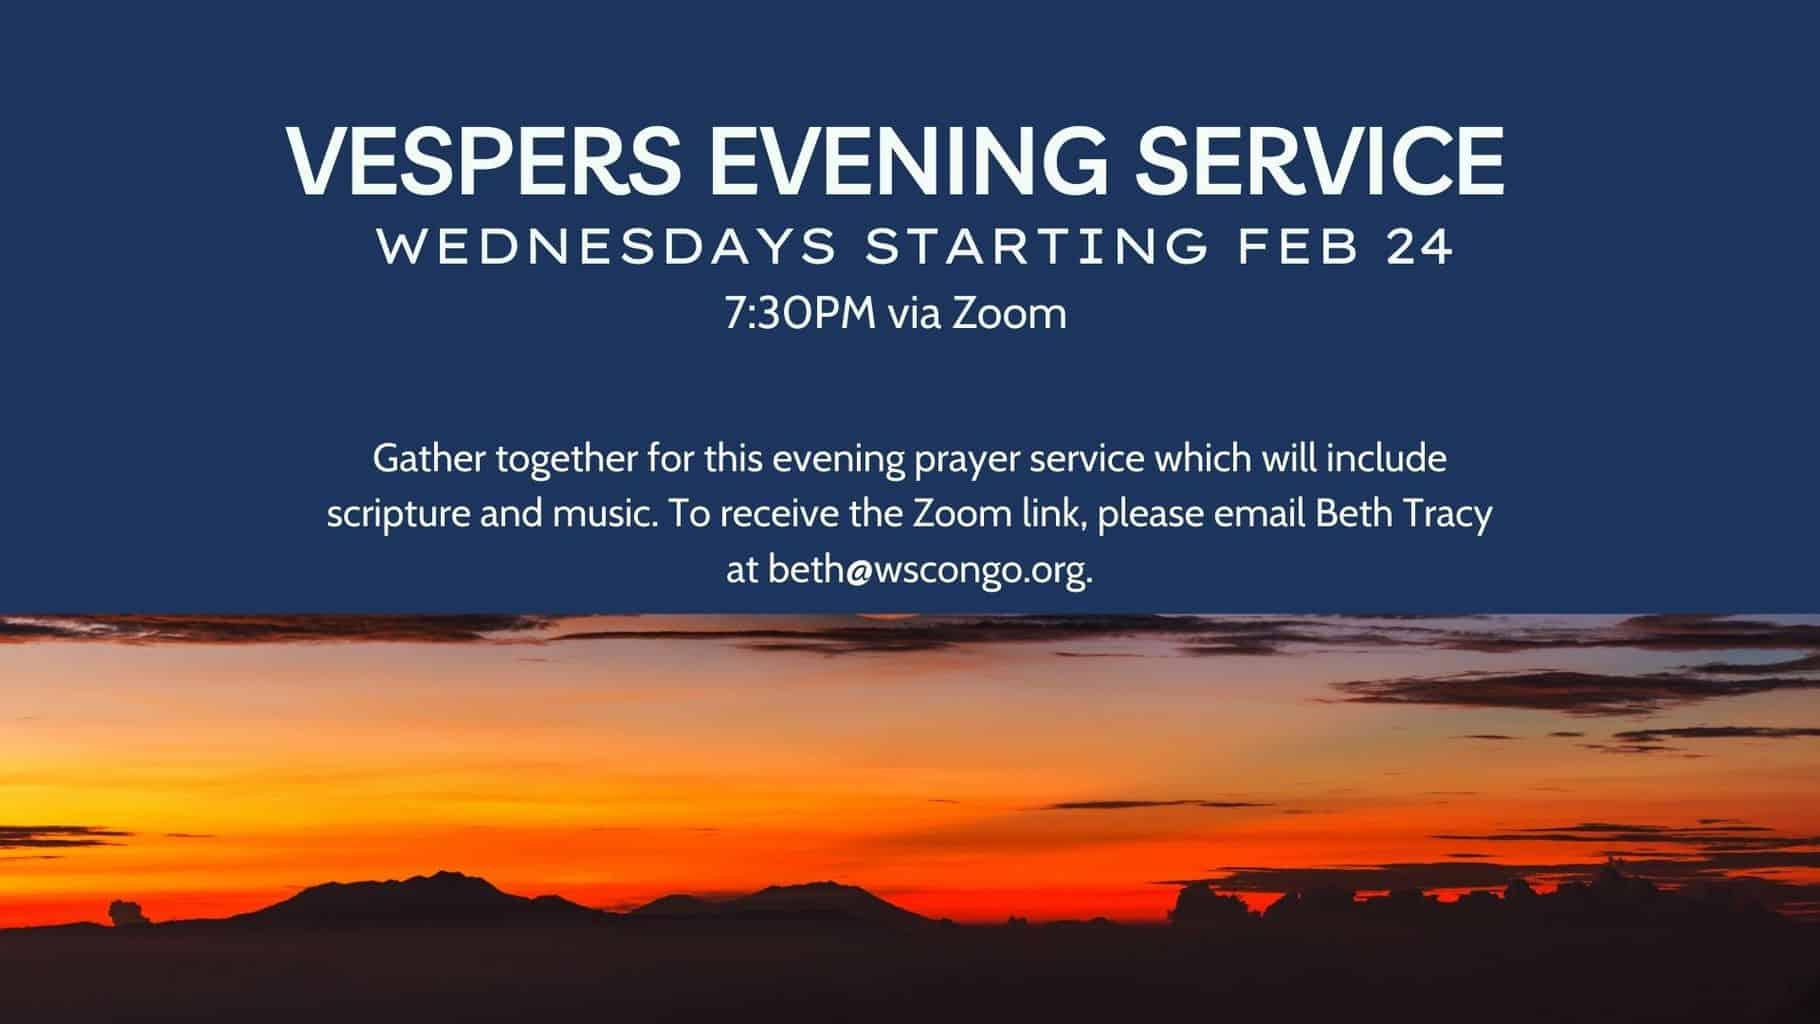 Vespers Evening prayer service